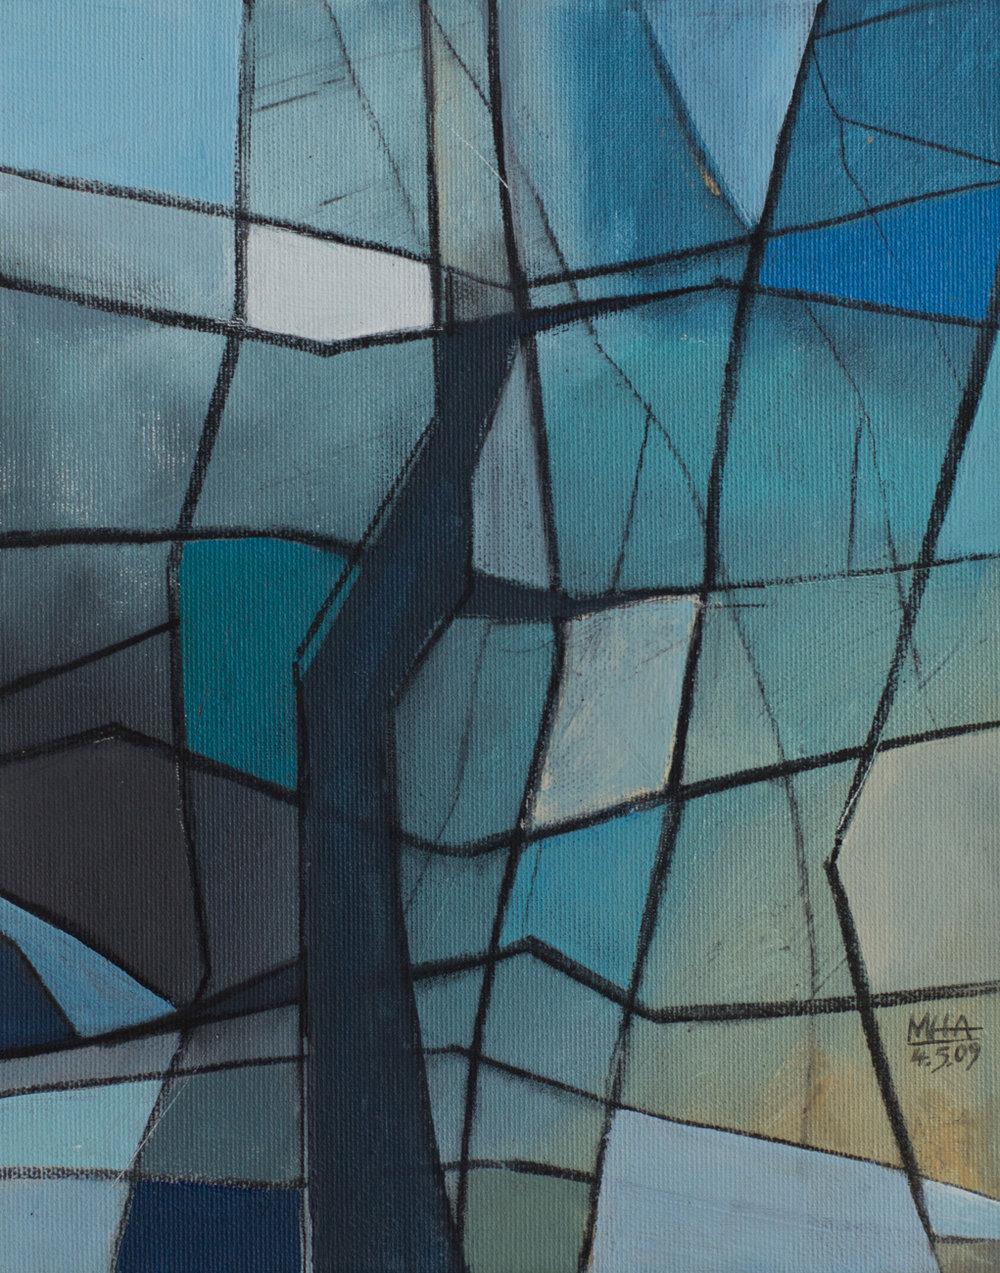 Fantasie in Linien 14 , 2009,Acryl auf Leinwand, 24x30 cm